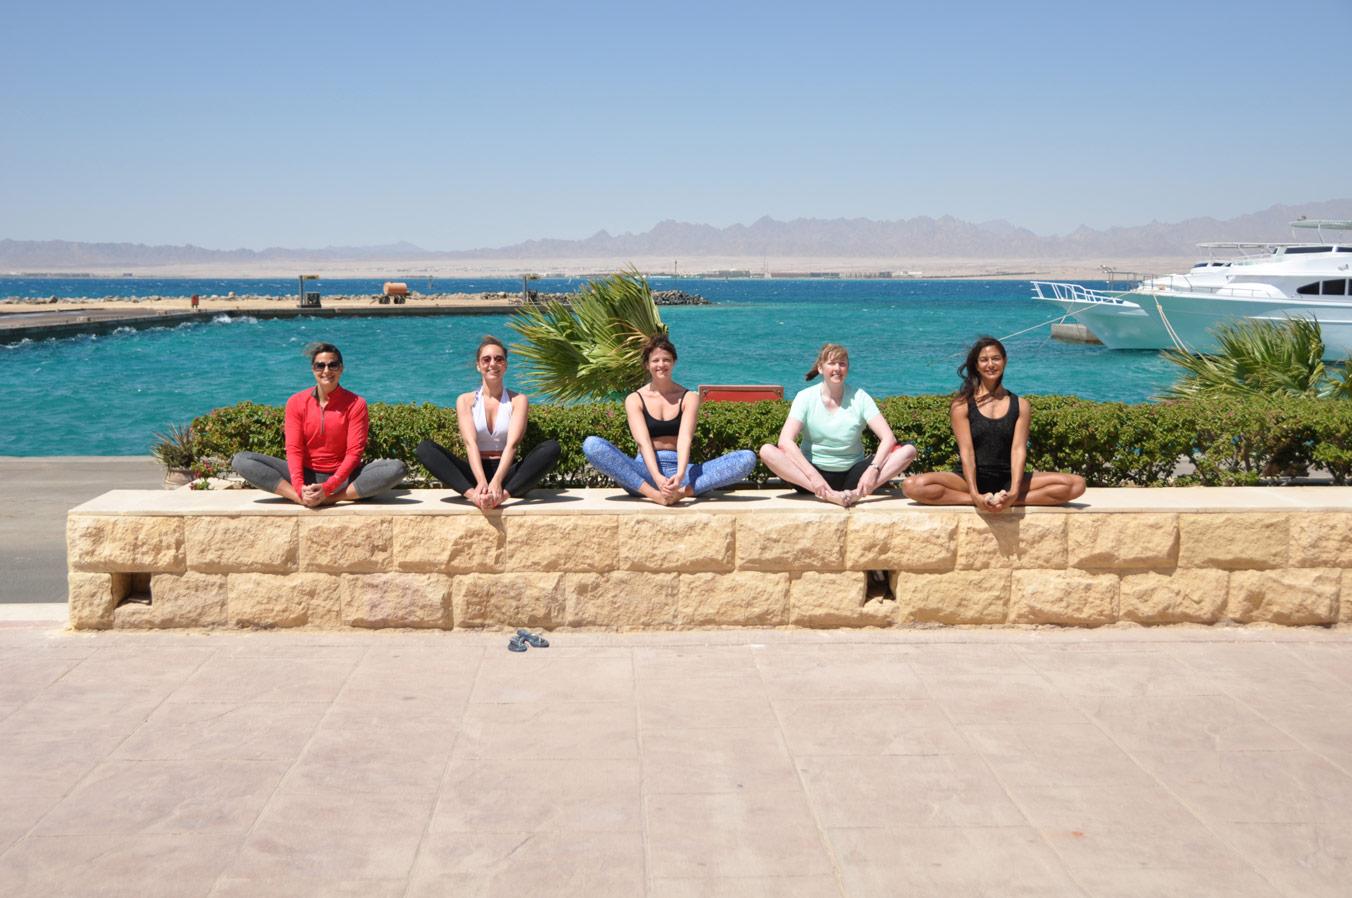 Stretching in Egypt Yoga Retreat